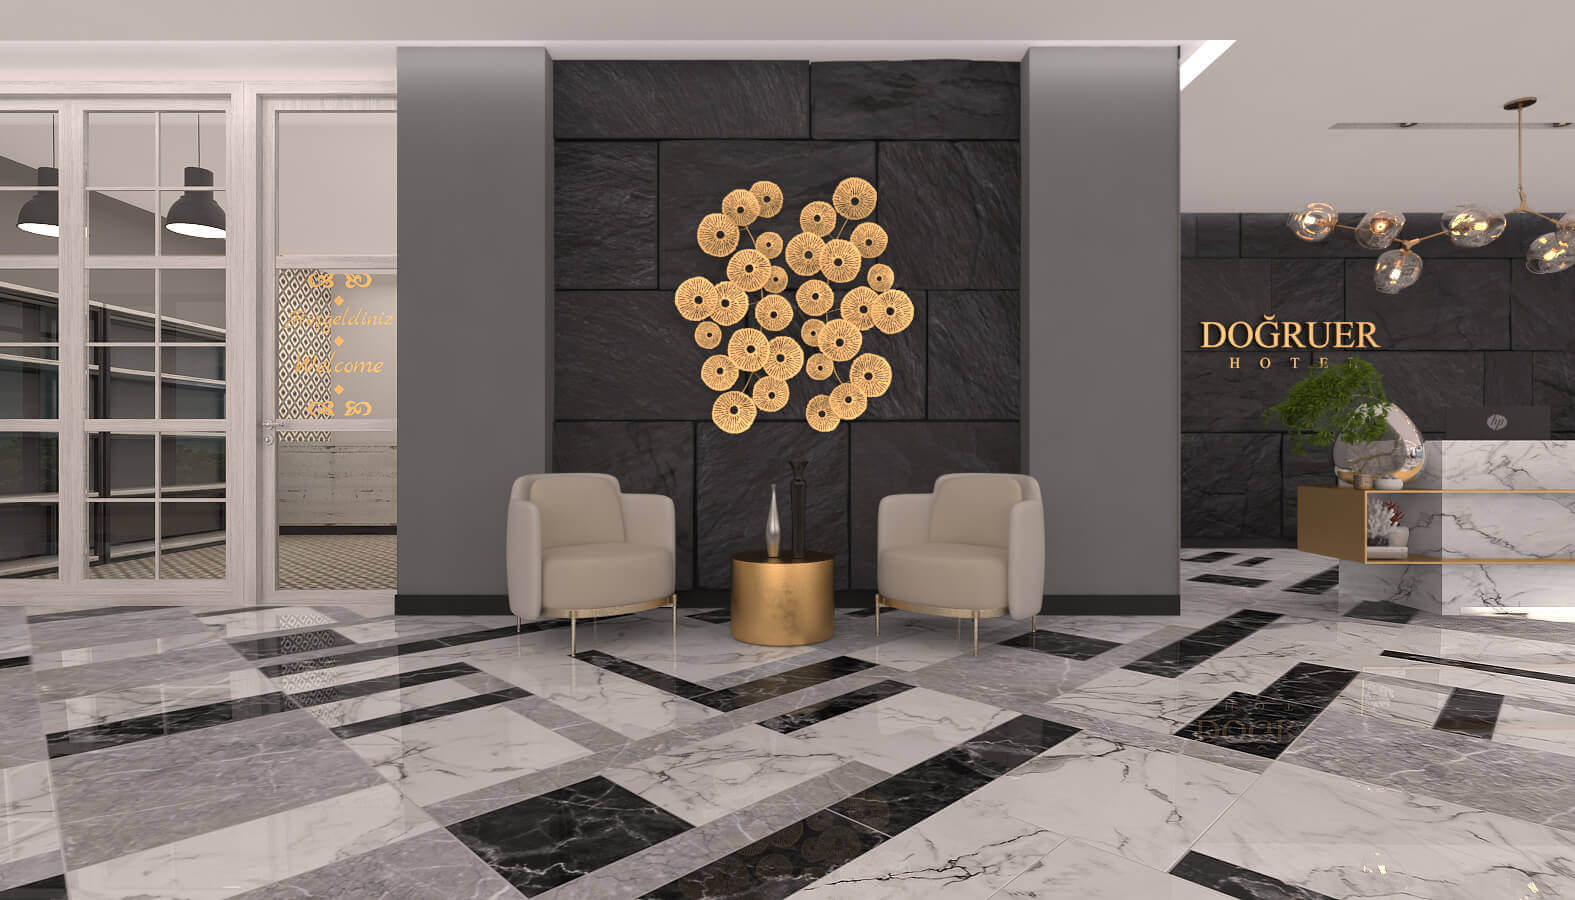 Ören 3587 Dogruer hotel Hotels